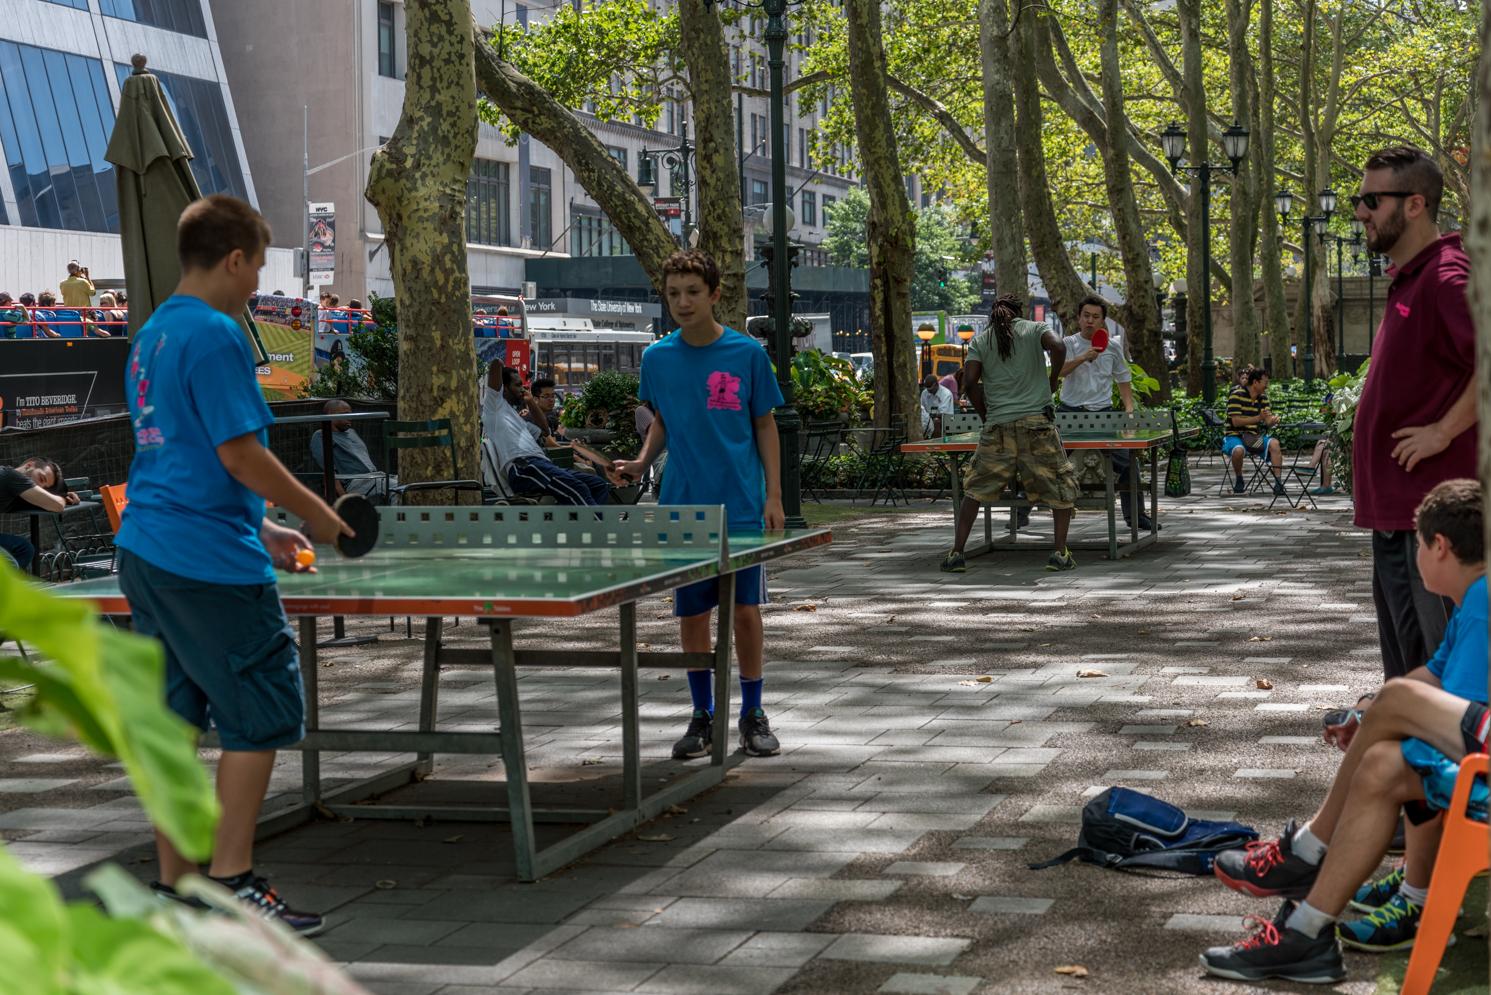 ROCK MAMA NYC LIFESTYLE BLOG - FUN SUMMER TIME AT BRYANT PARK